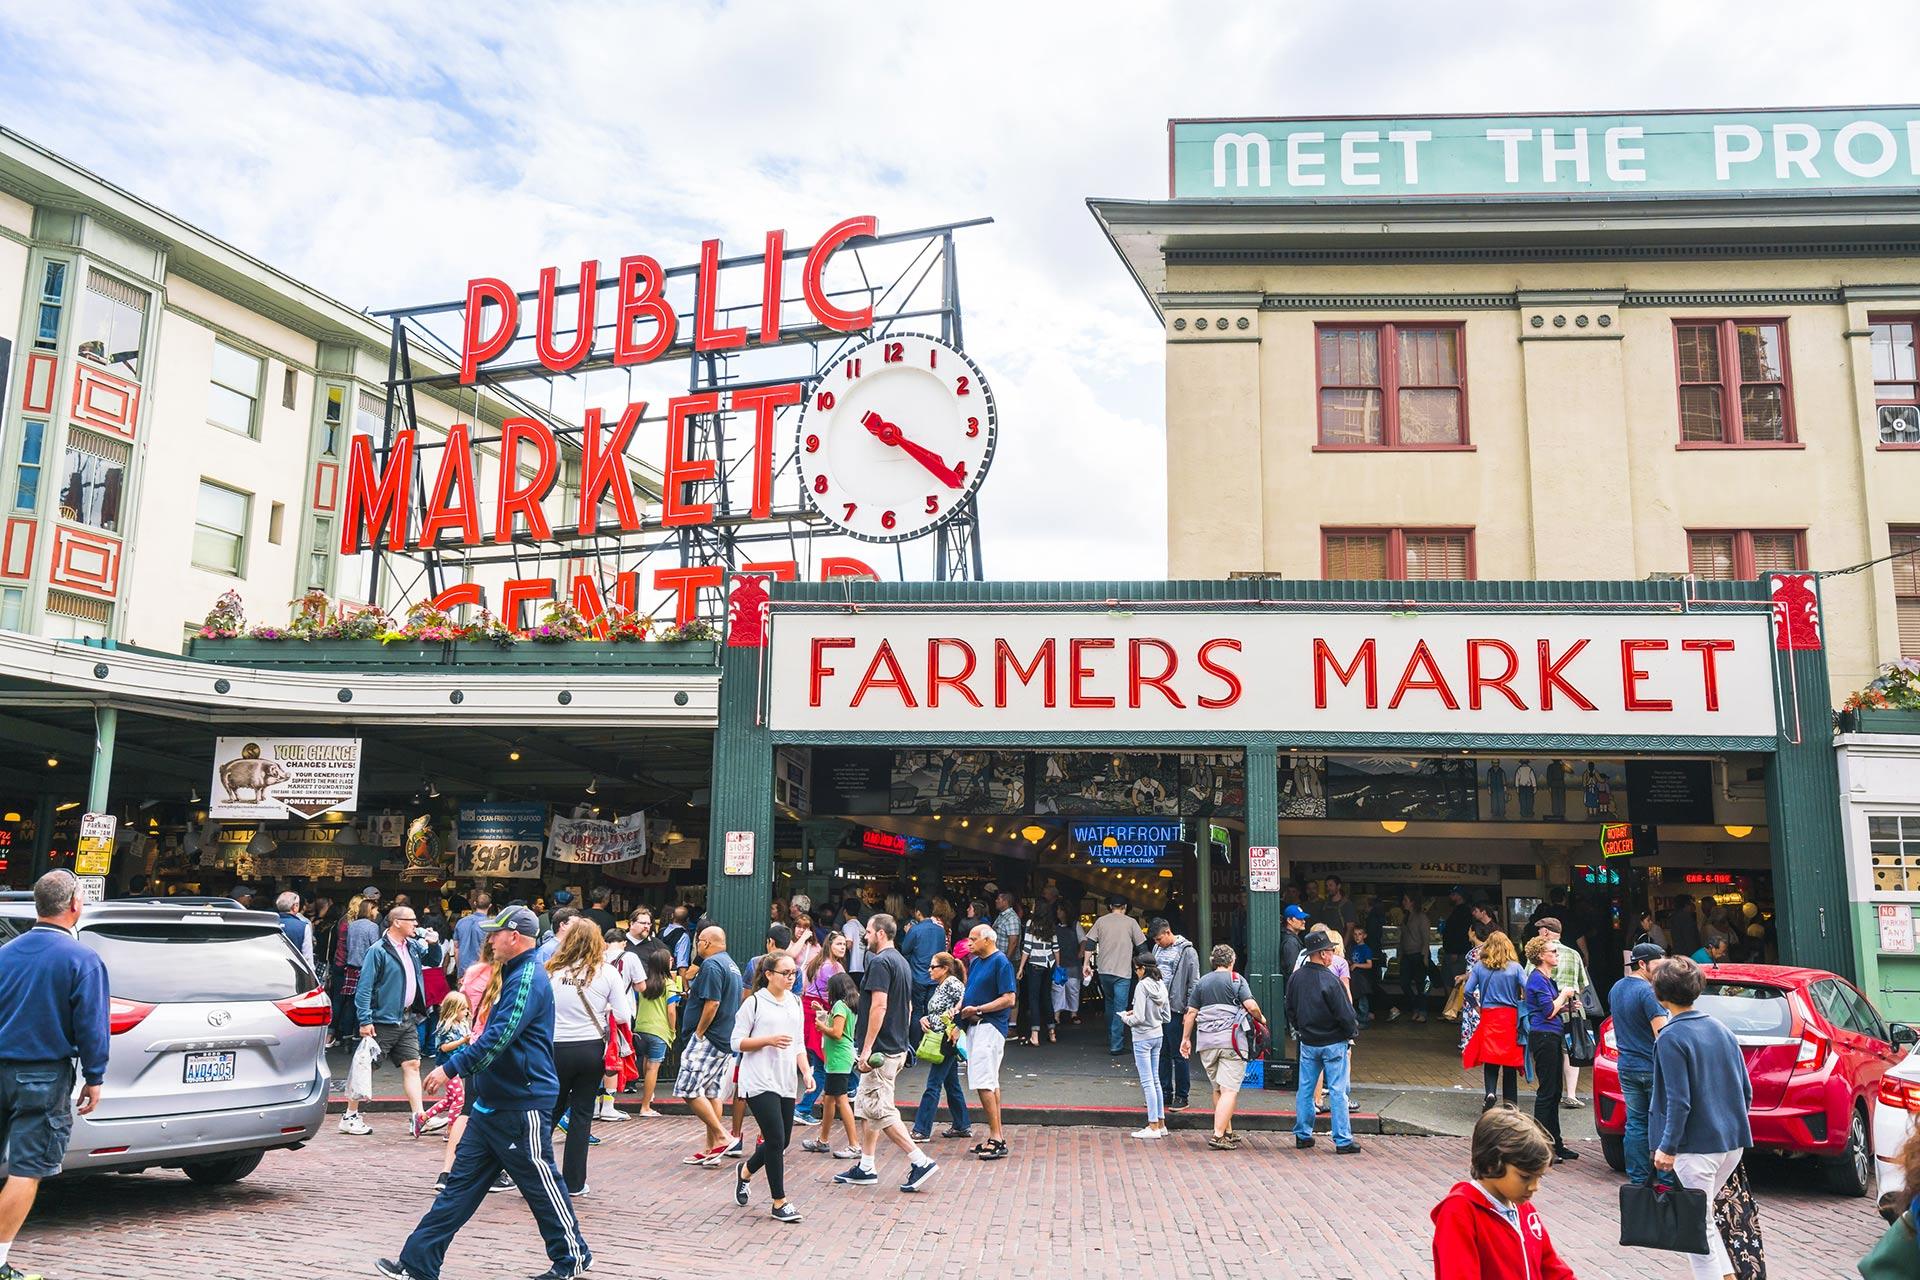 Pike Place Market in Seattle, Washington.